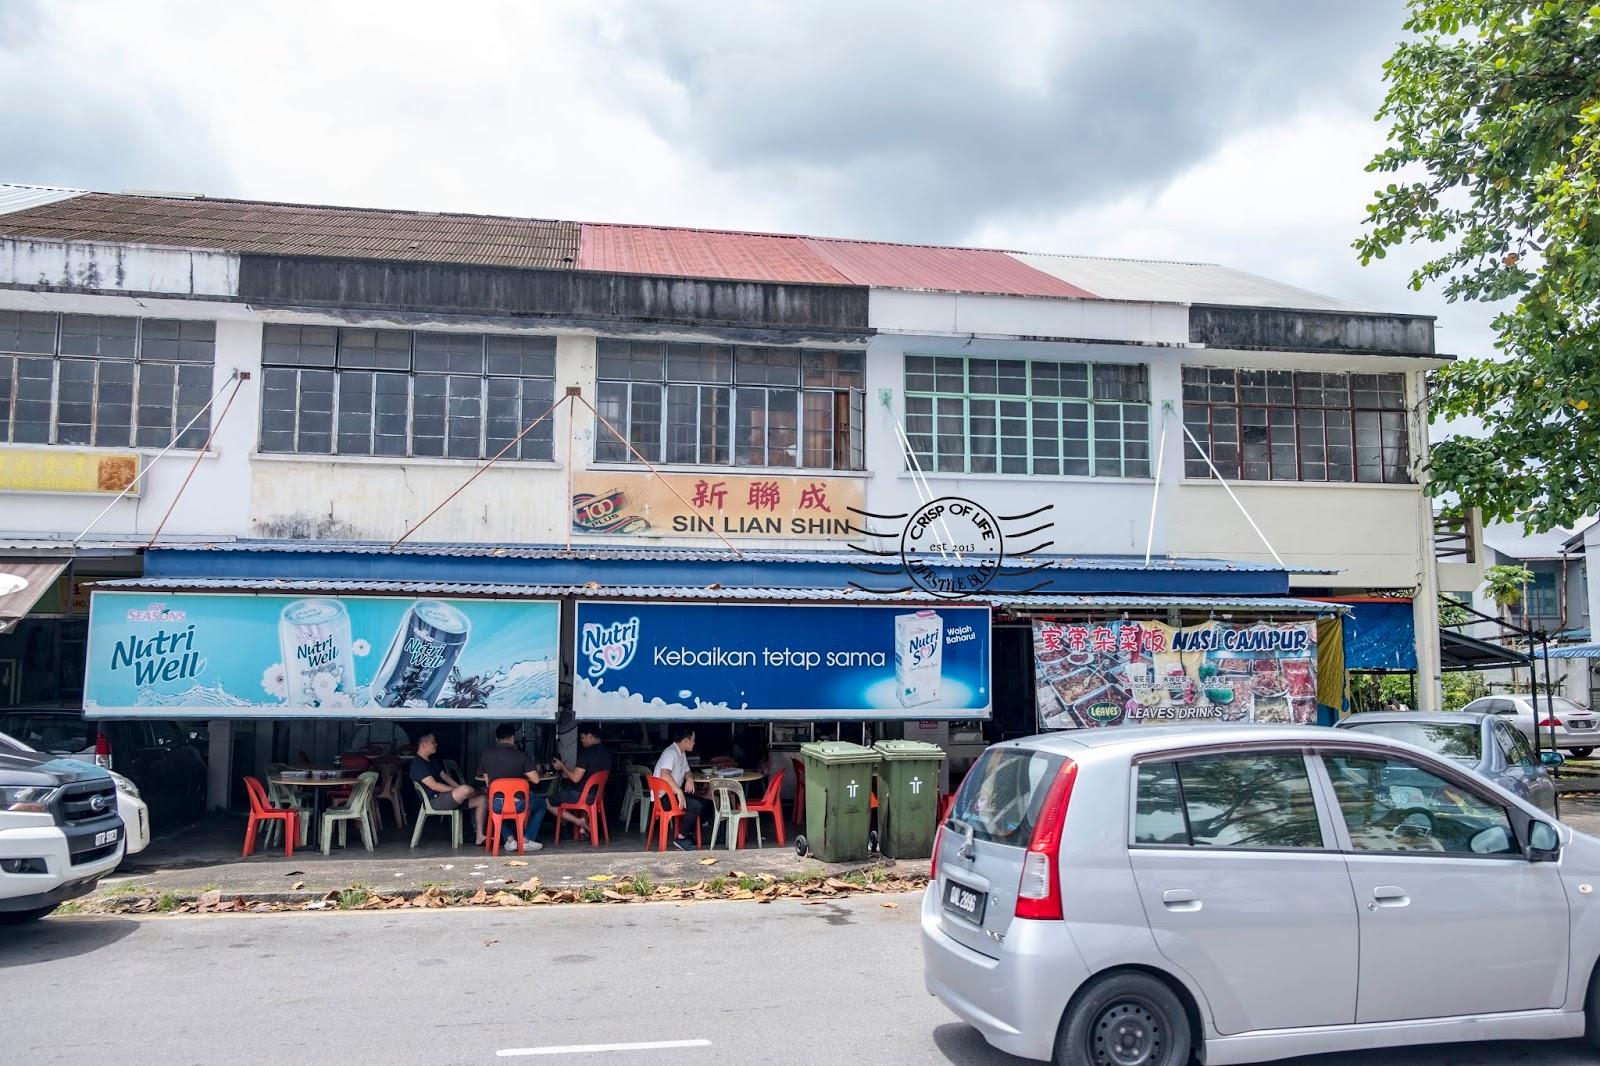 The Best Kolo Mee @ Sin Lian Shin, Kuching, Sarawak